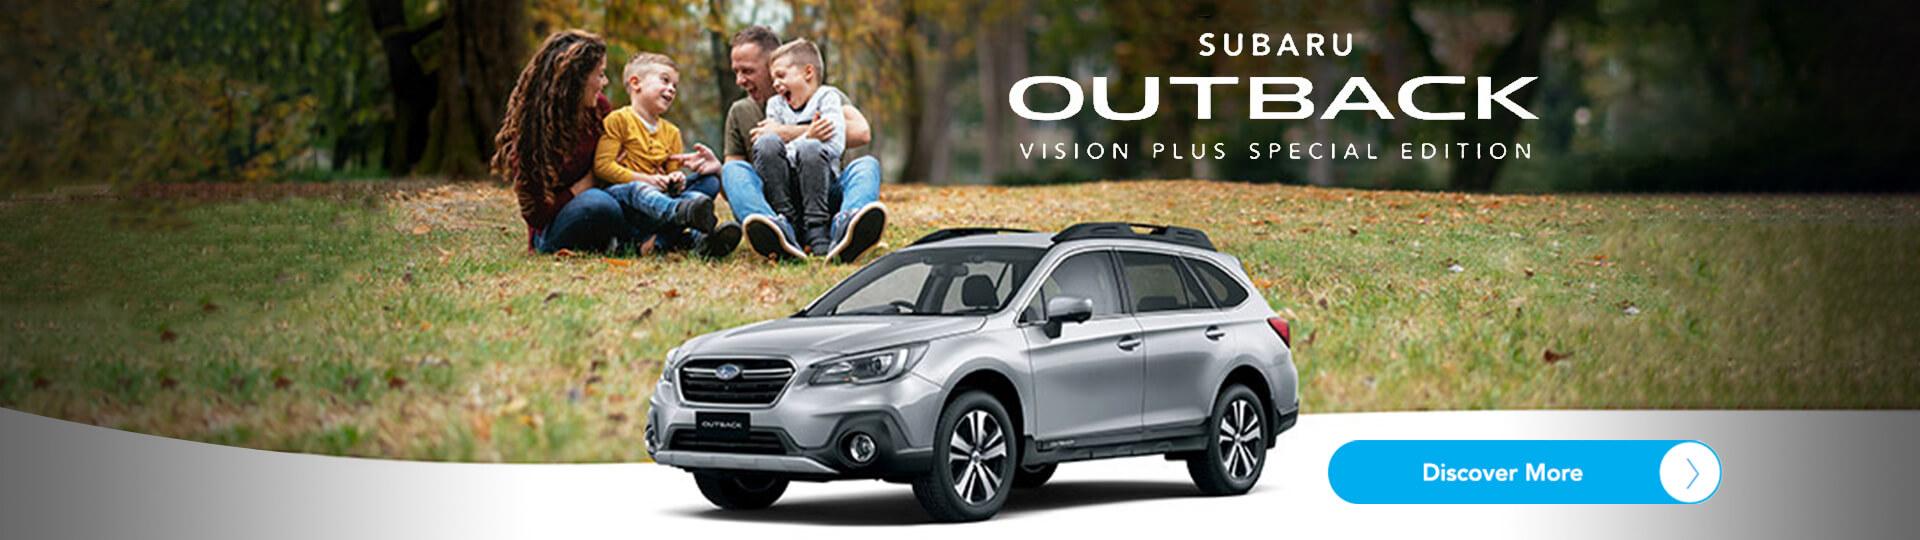 DC motors Subaru Offers